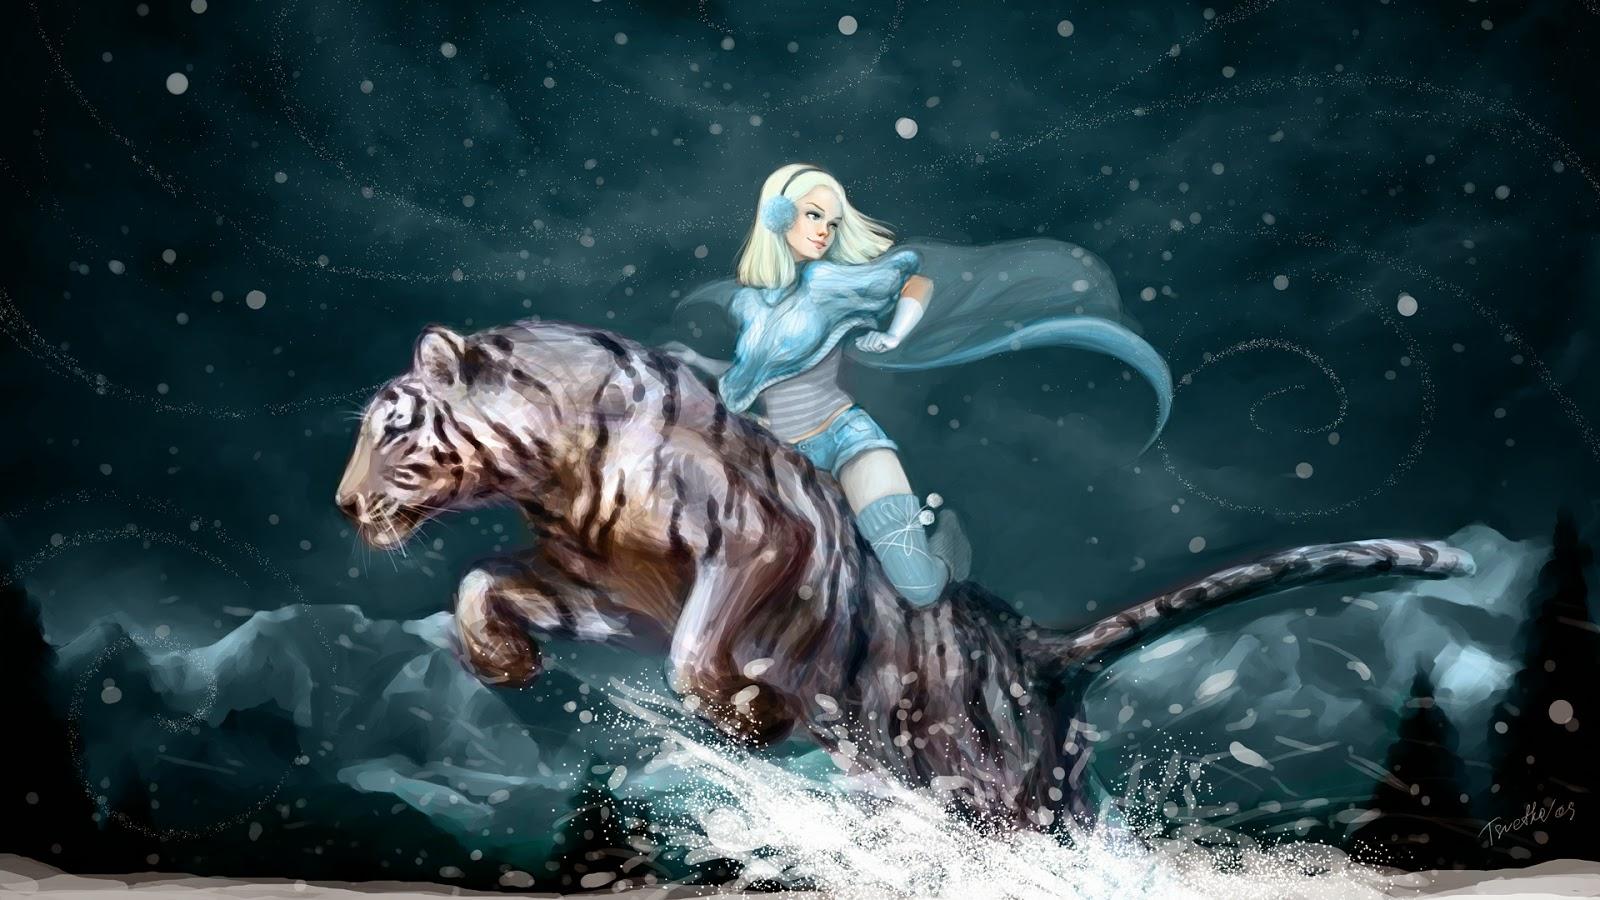 Girl riding tiger anime wallpaper free wallpaper hd girl riding tiger anime wallpaper voltagebd Images